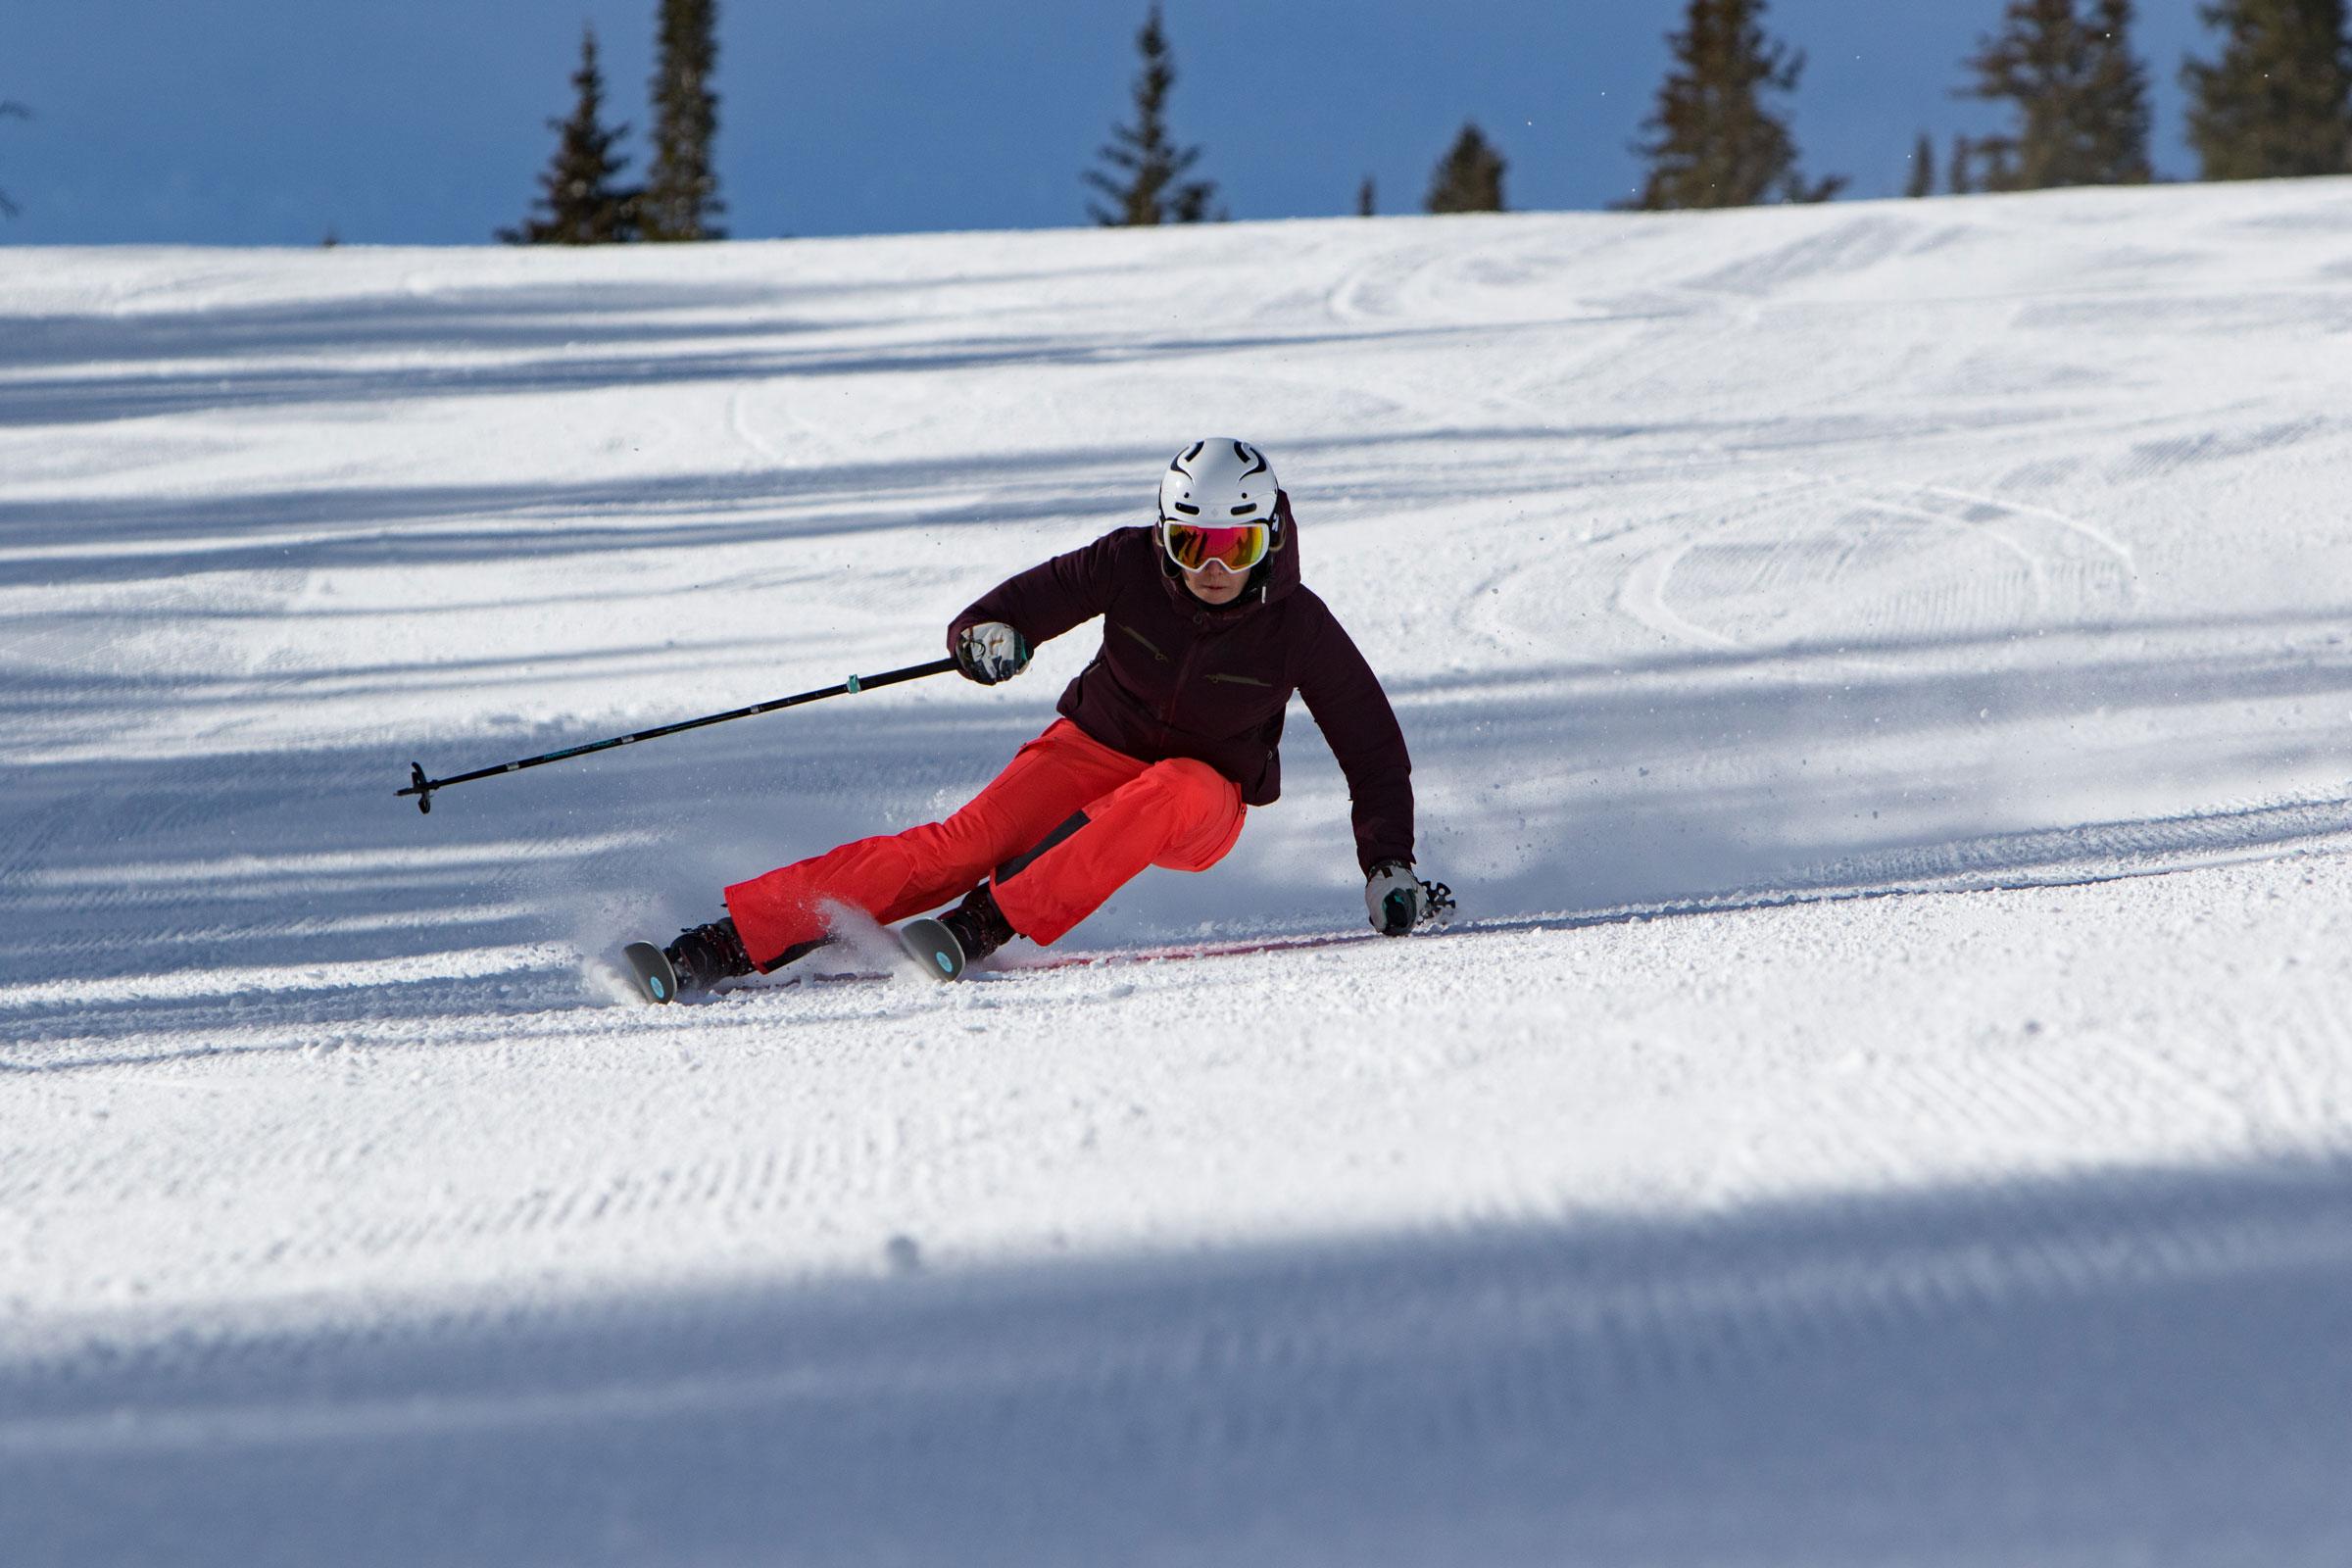 pierde în greutate nortictrack skier)